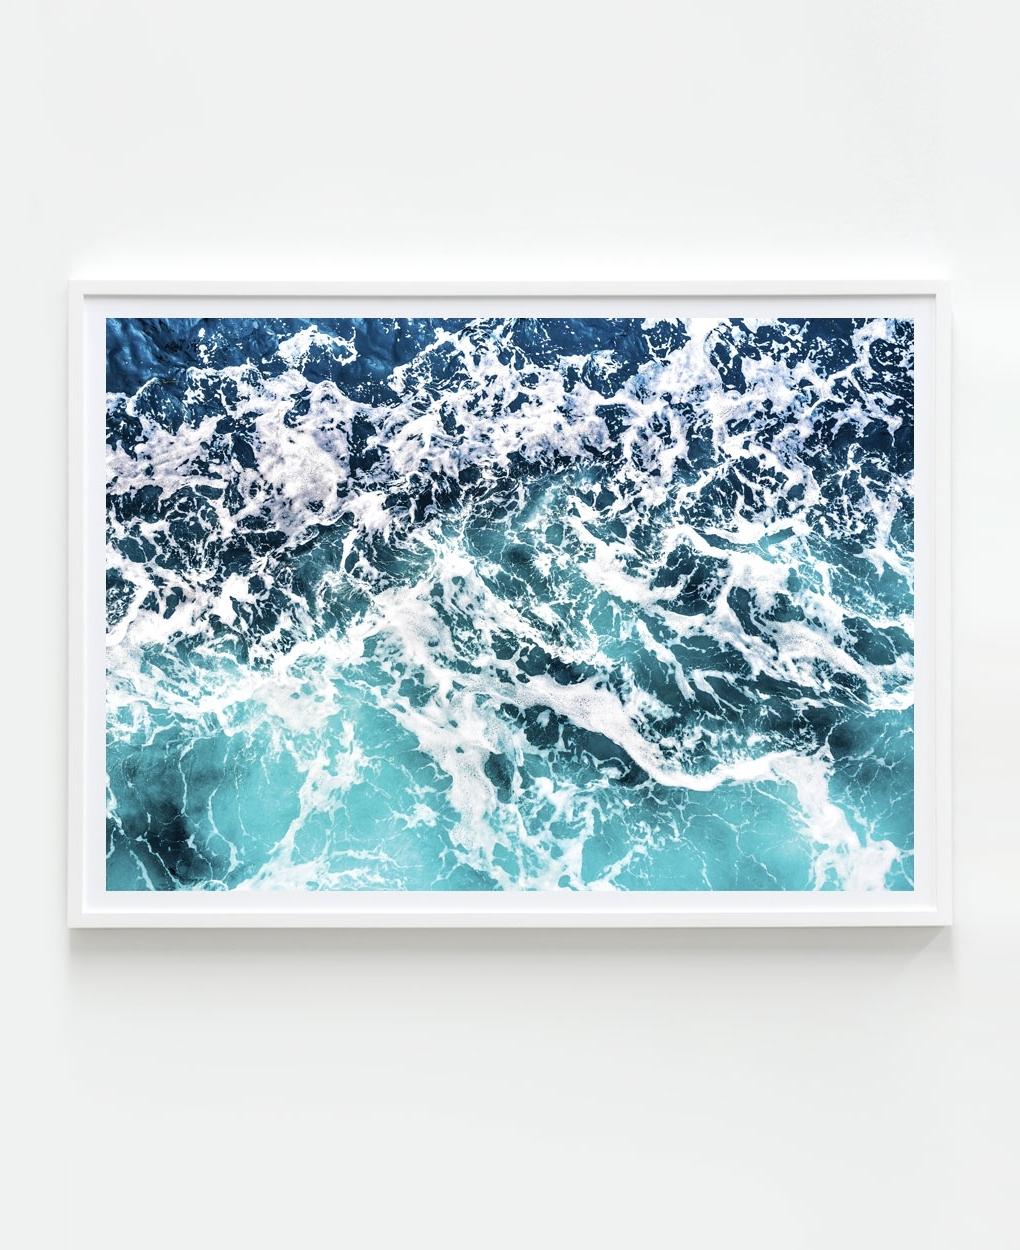 39 Ocean Wall Art, Orca Killer Whale Sea Ocean Wall Art Mural Decor inside Most Up-to-Date Ocean Wall Art